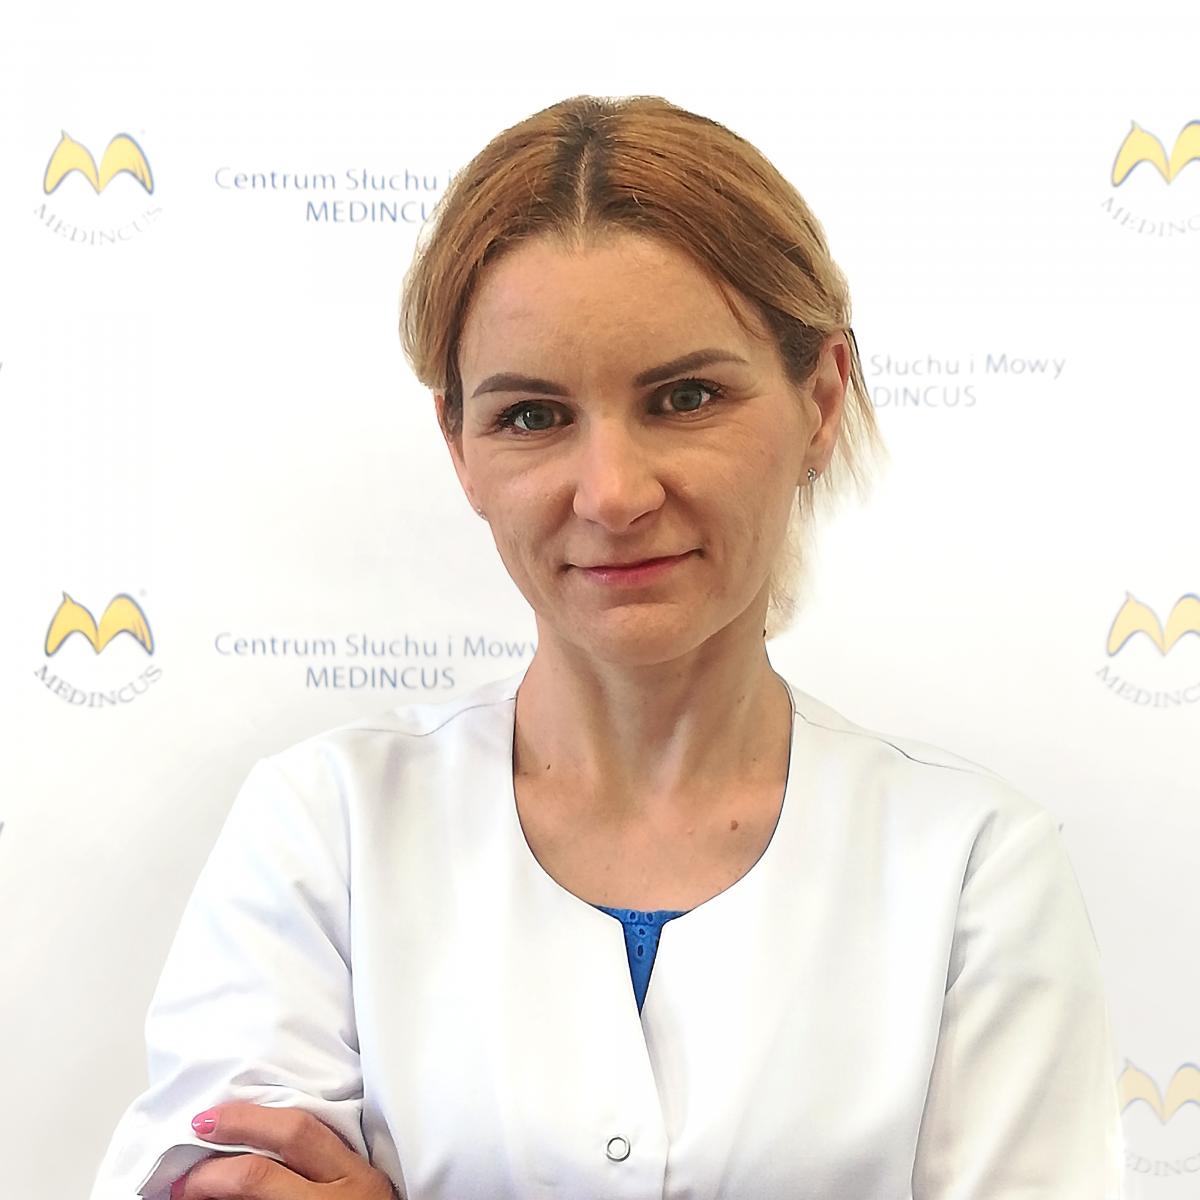 dr_BAINSKA_TORUN-1-1200x1200.png